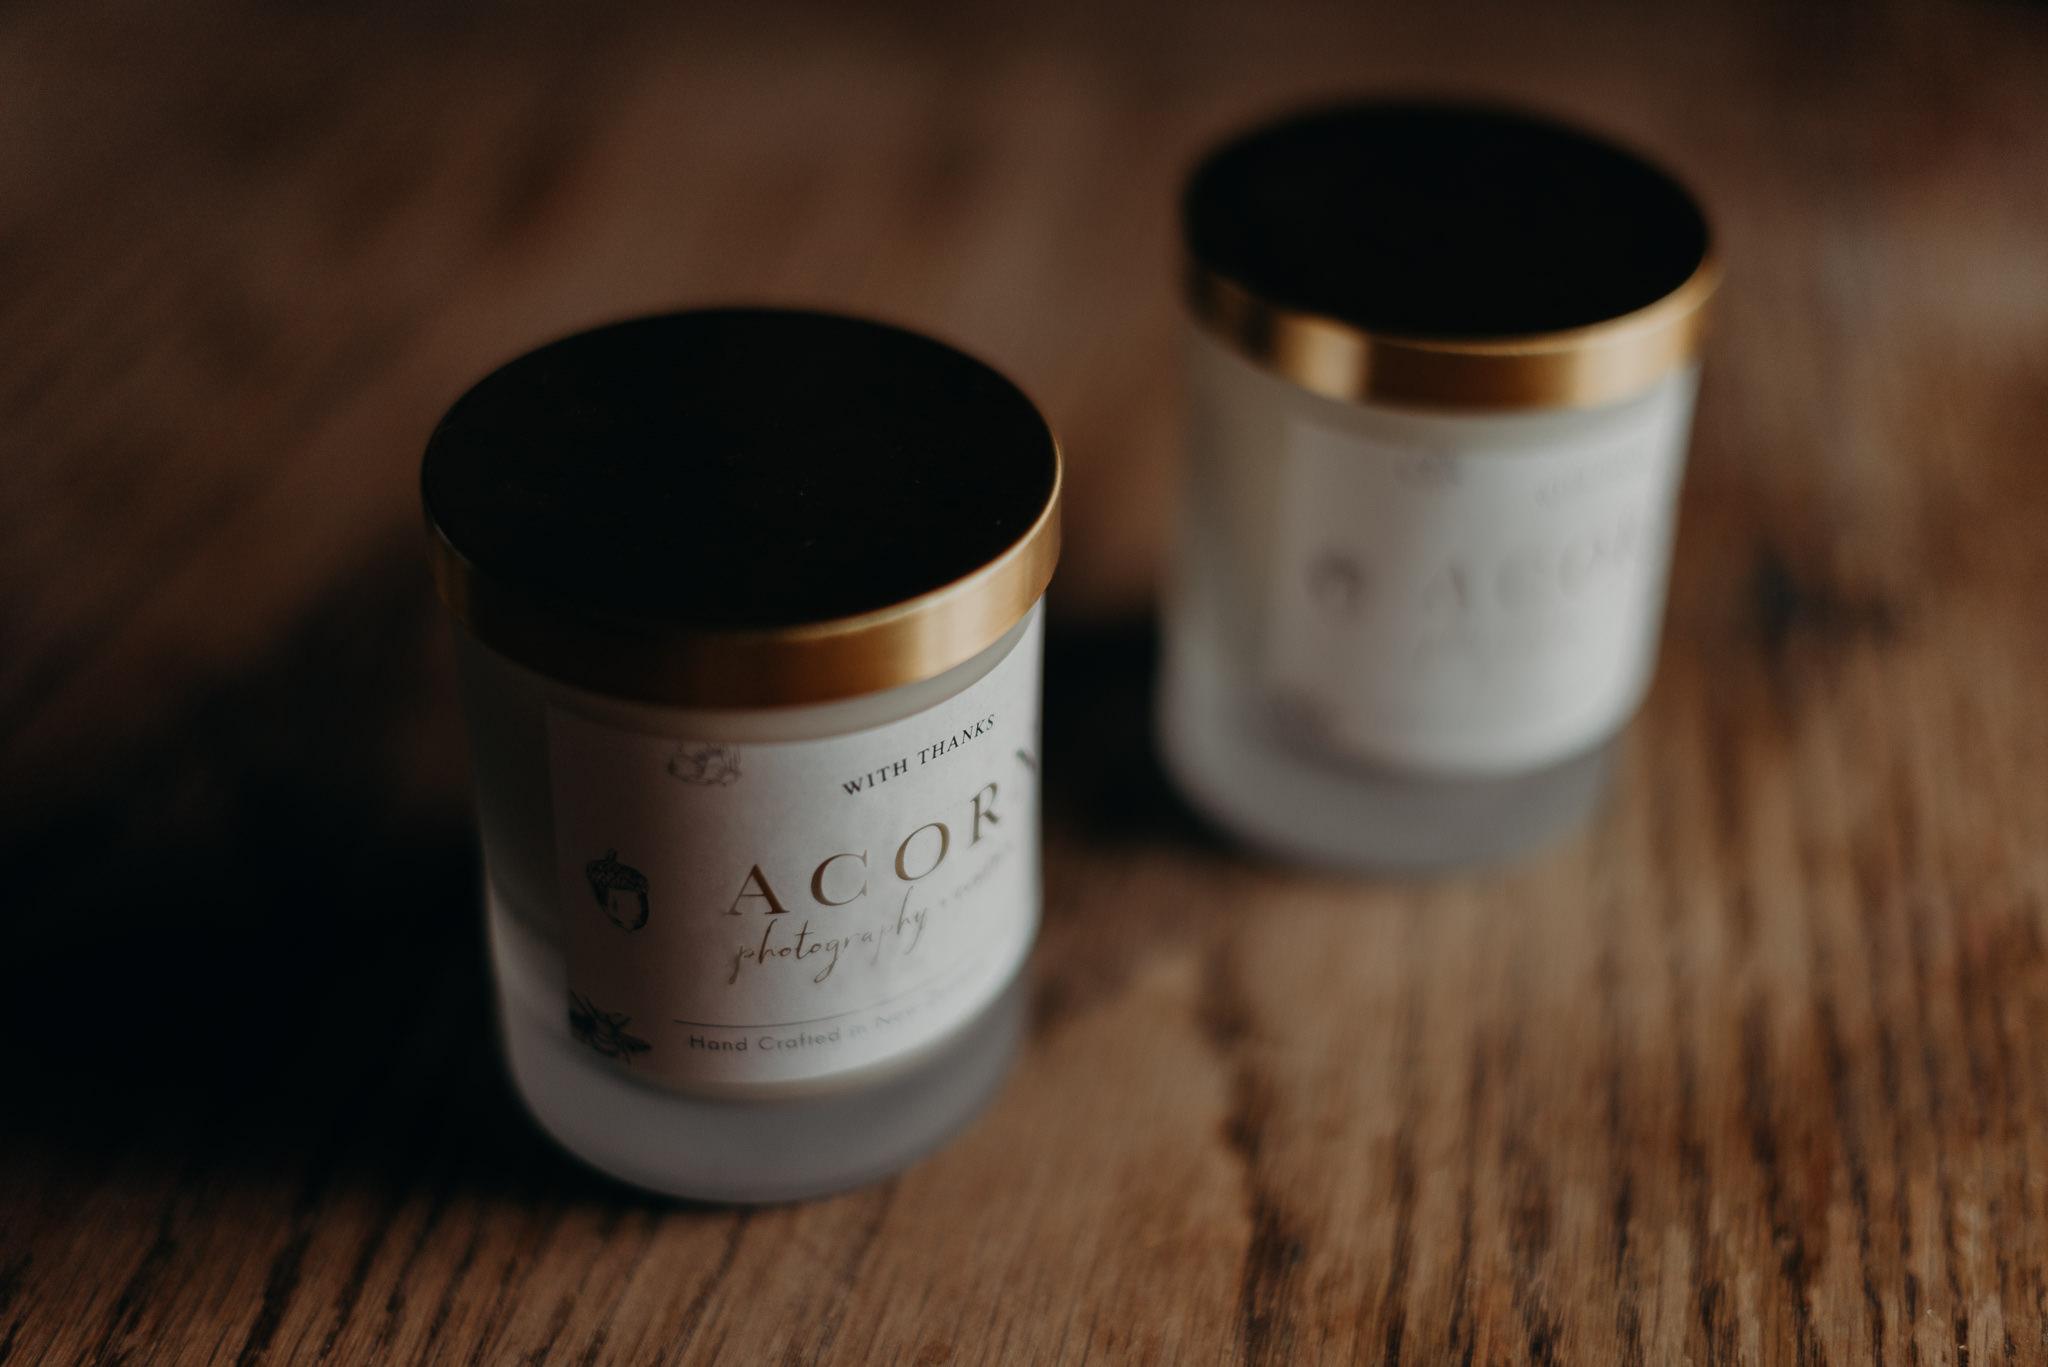 Handmade+soy+candles+-+Acorn+Photography+&+Cinema+Branding+and+packaging.+New+Zealand+Wedding+Photographer._-3.jpeg